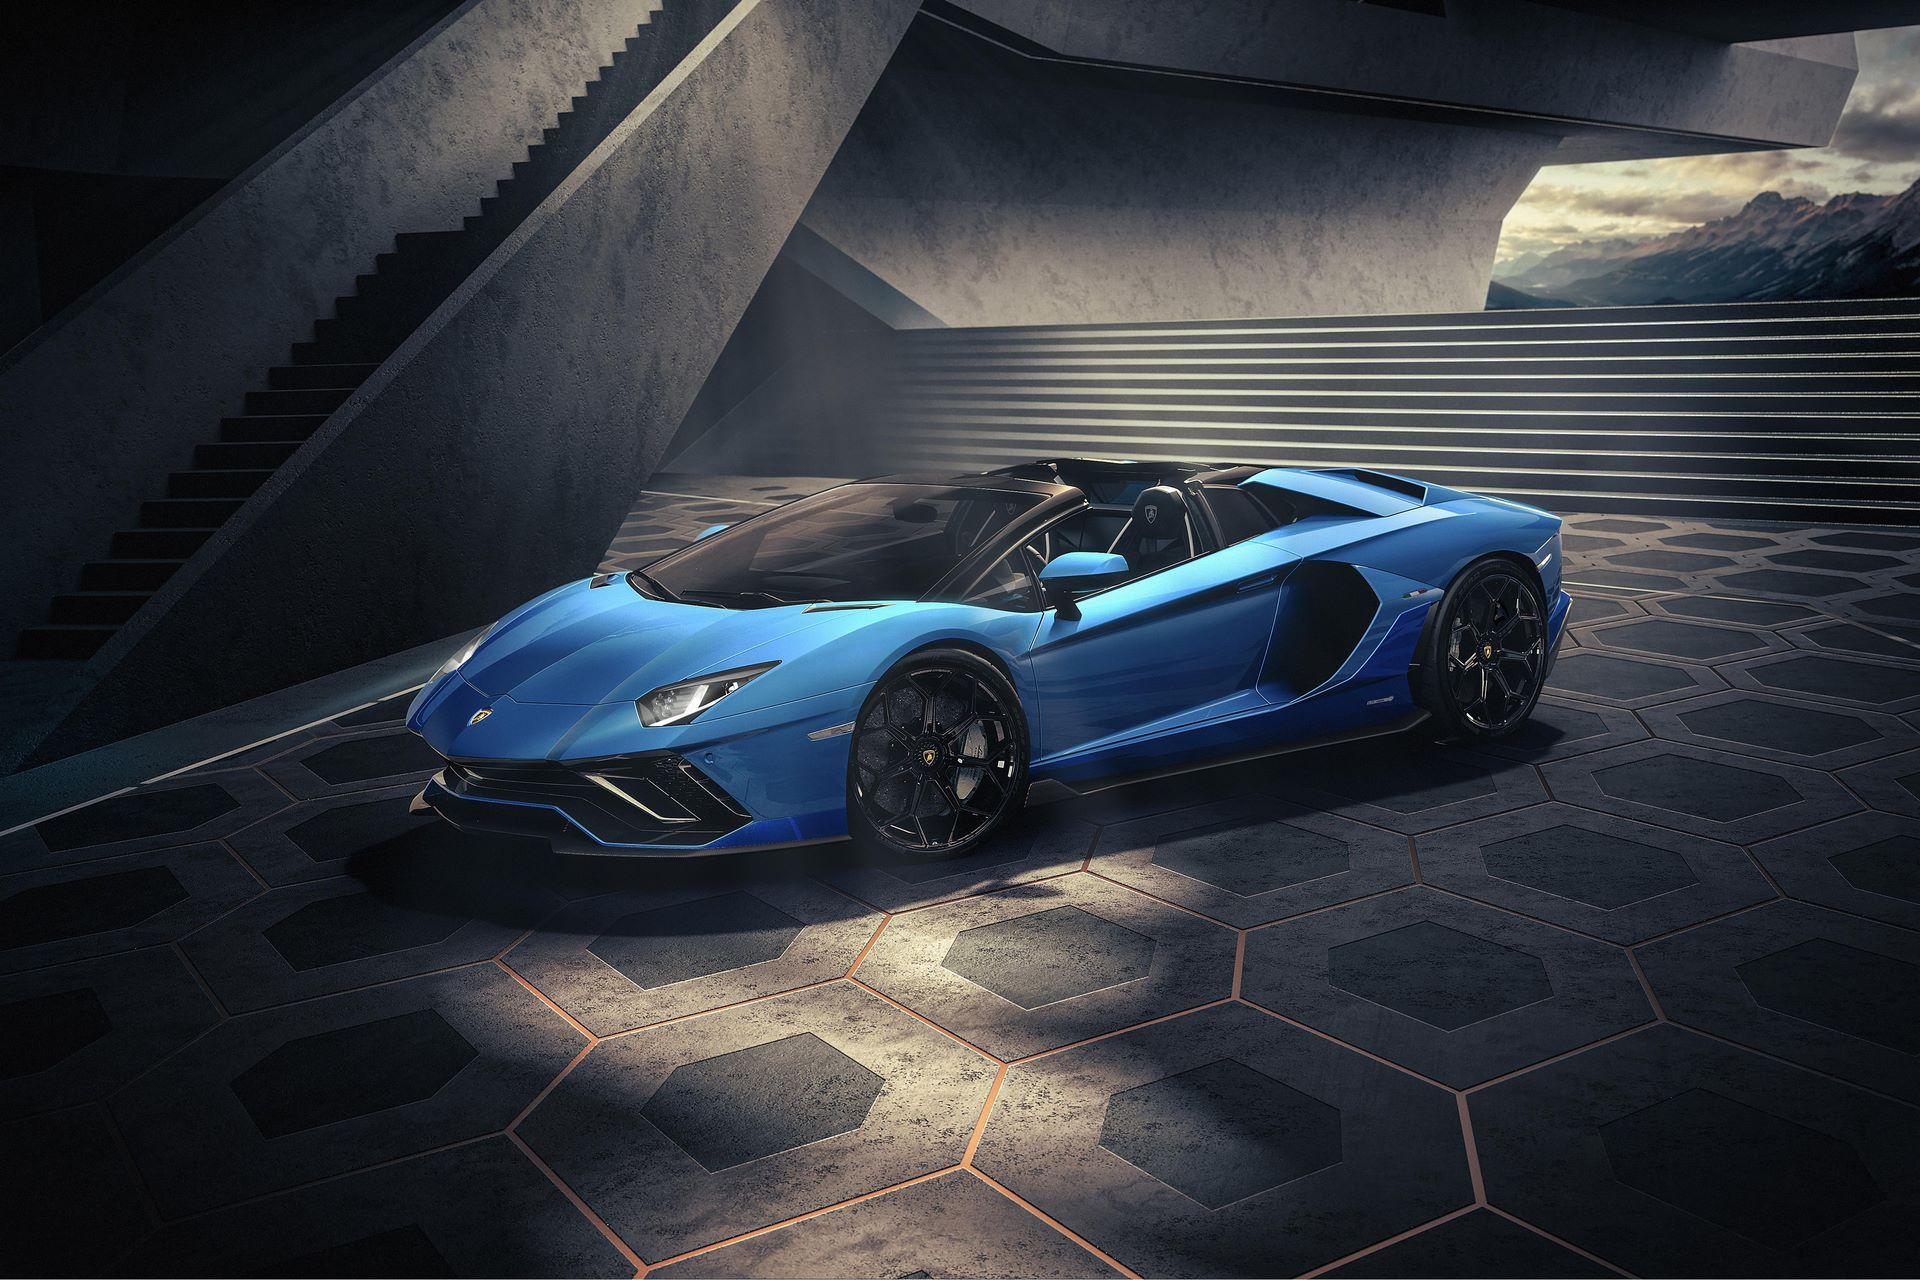 Lamborghini-Aventador-LP780-4-Ultimae-26